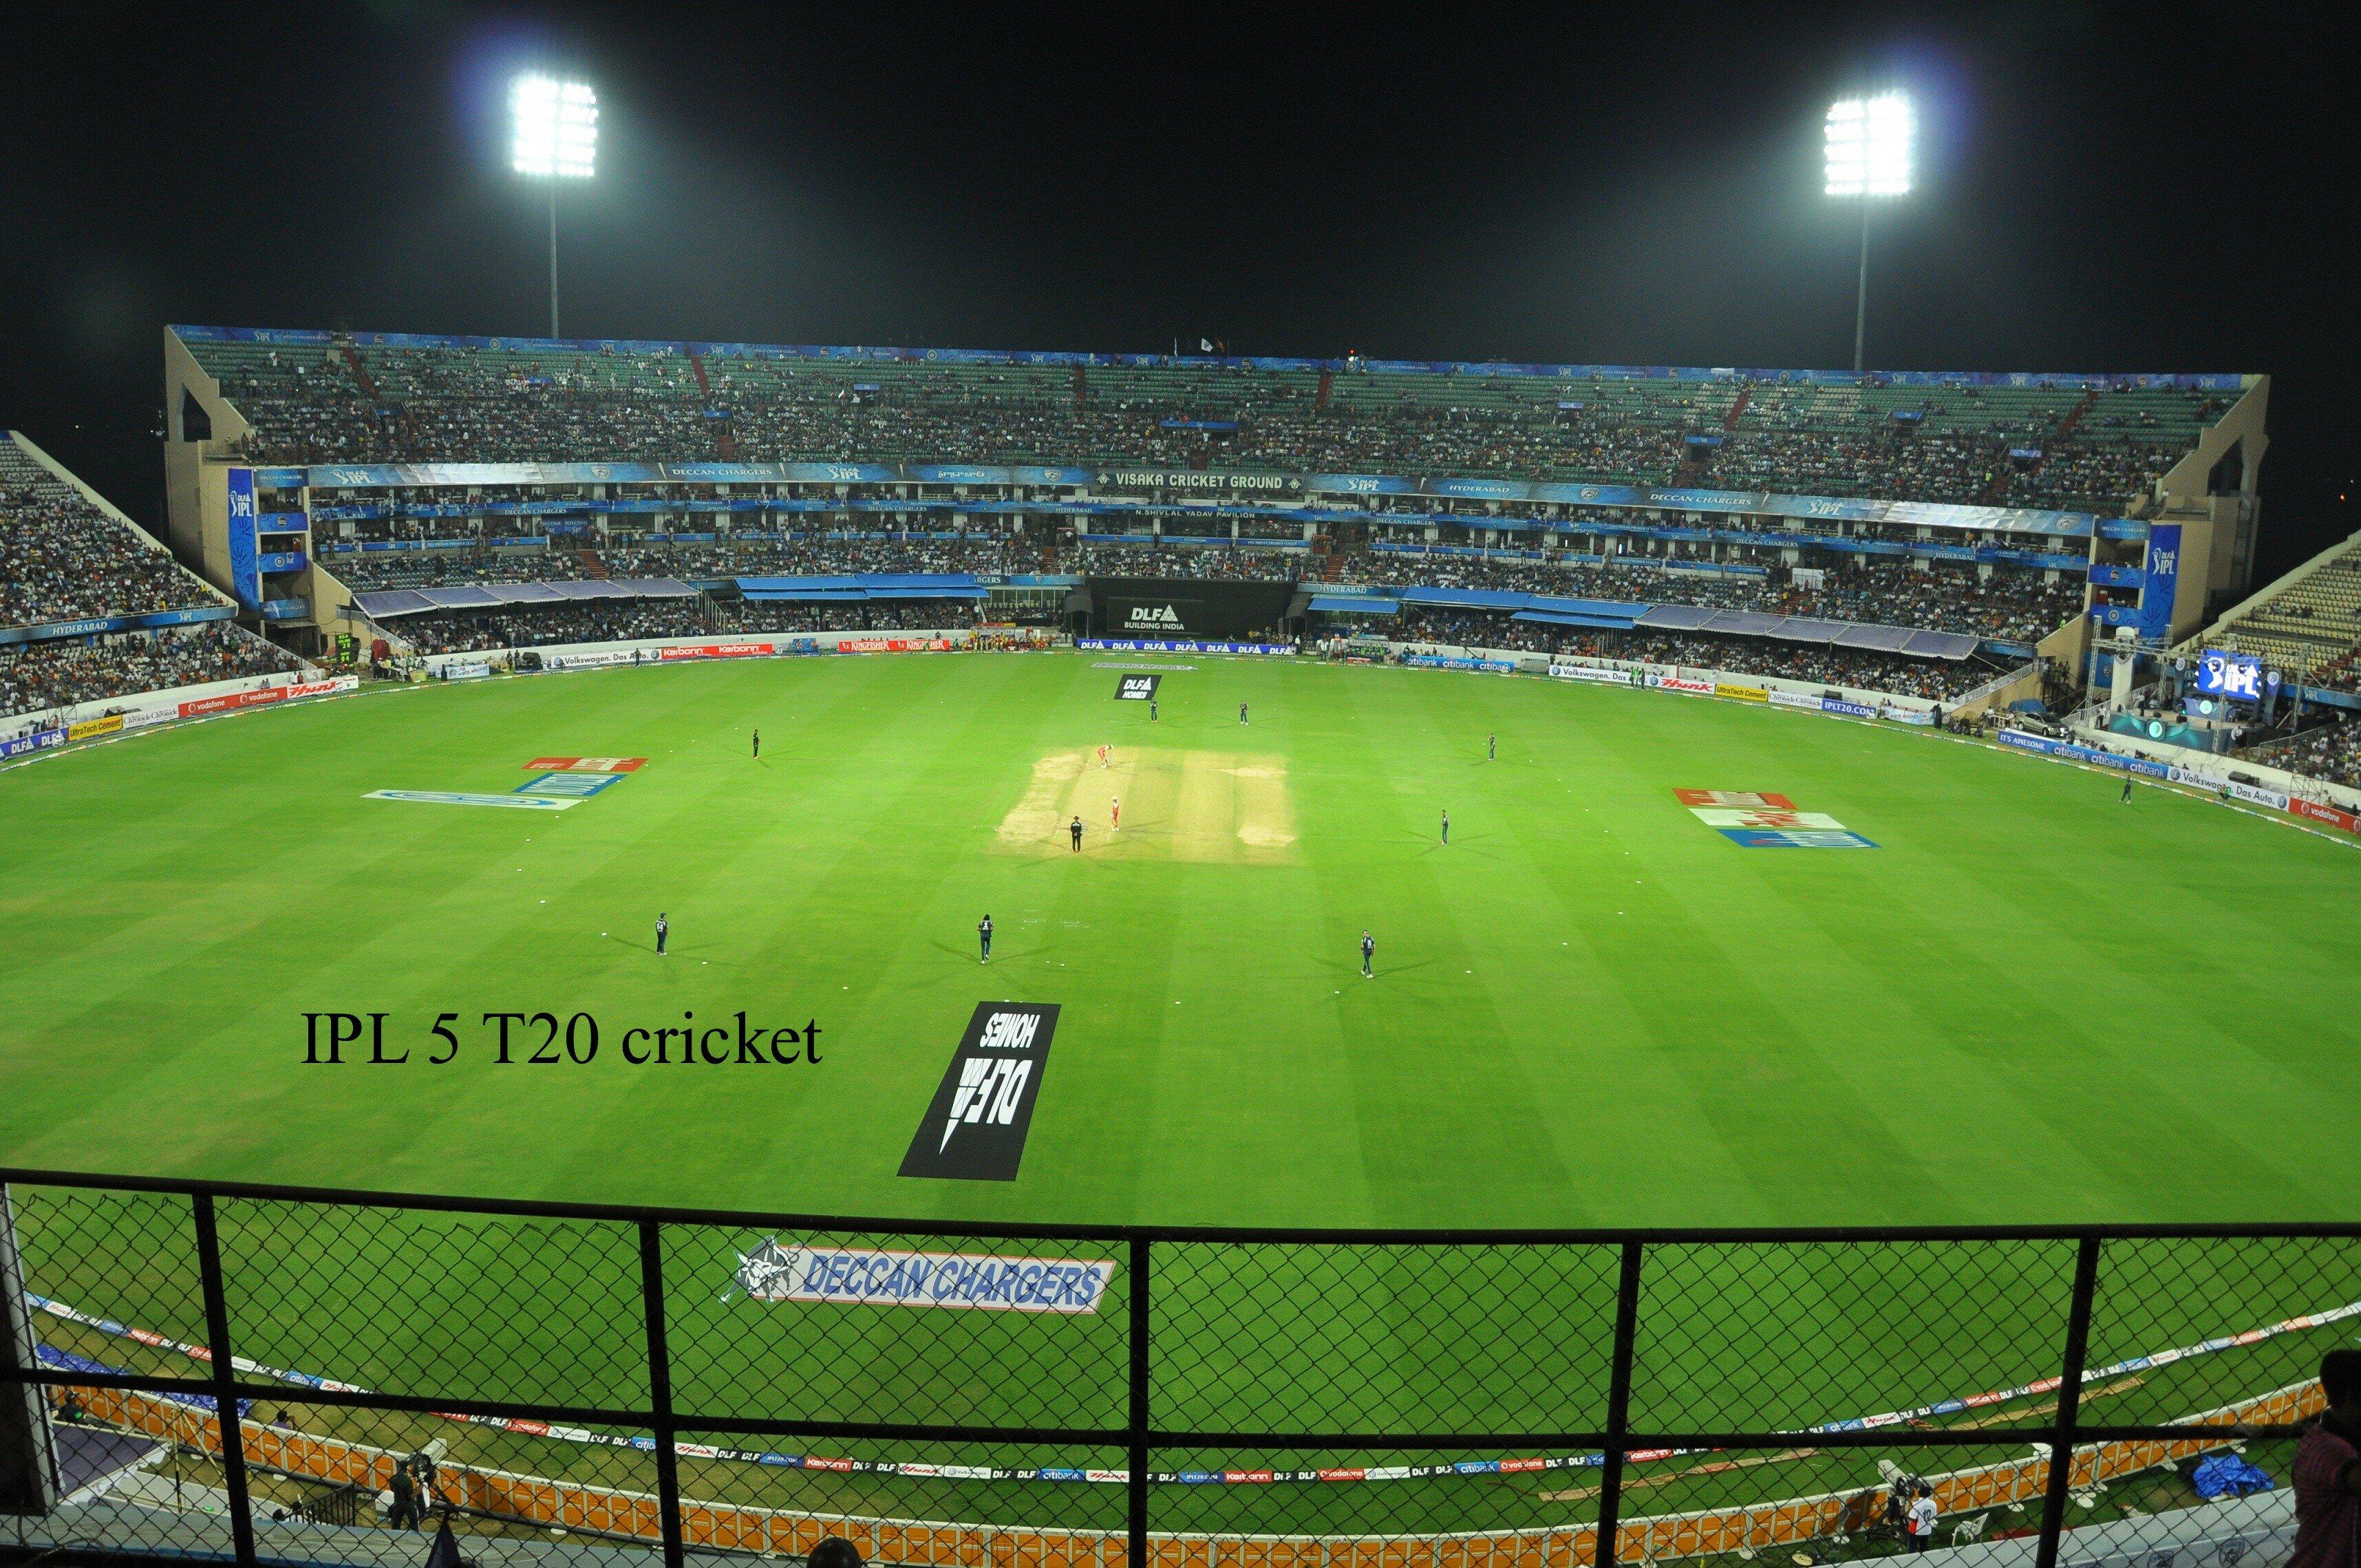 IPL T20 Cricket tournament